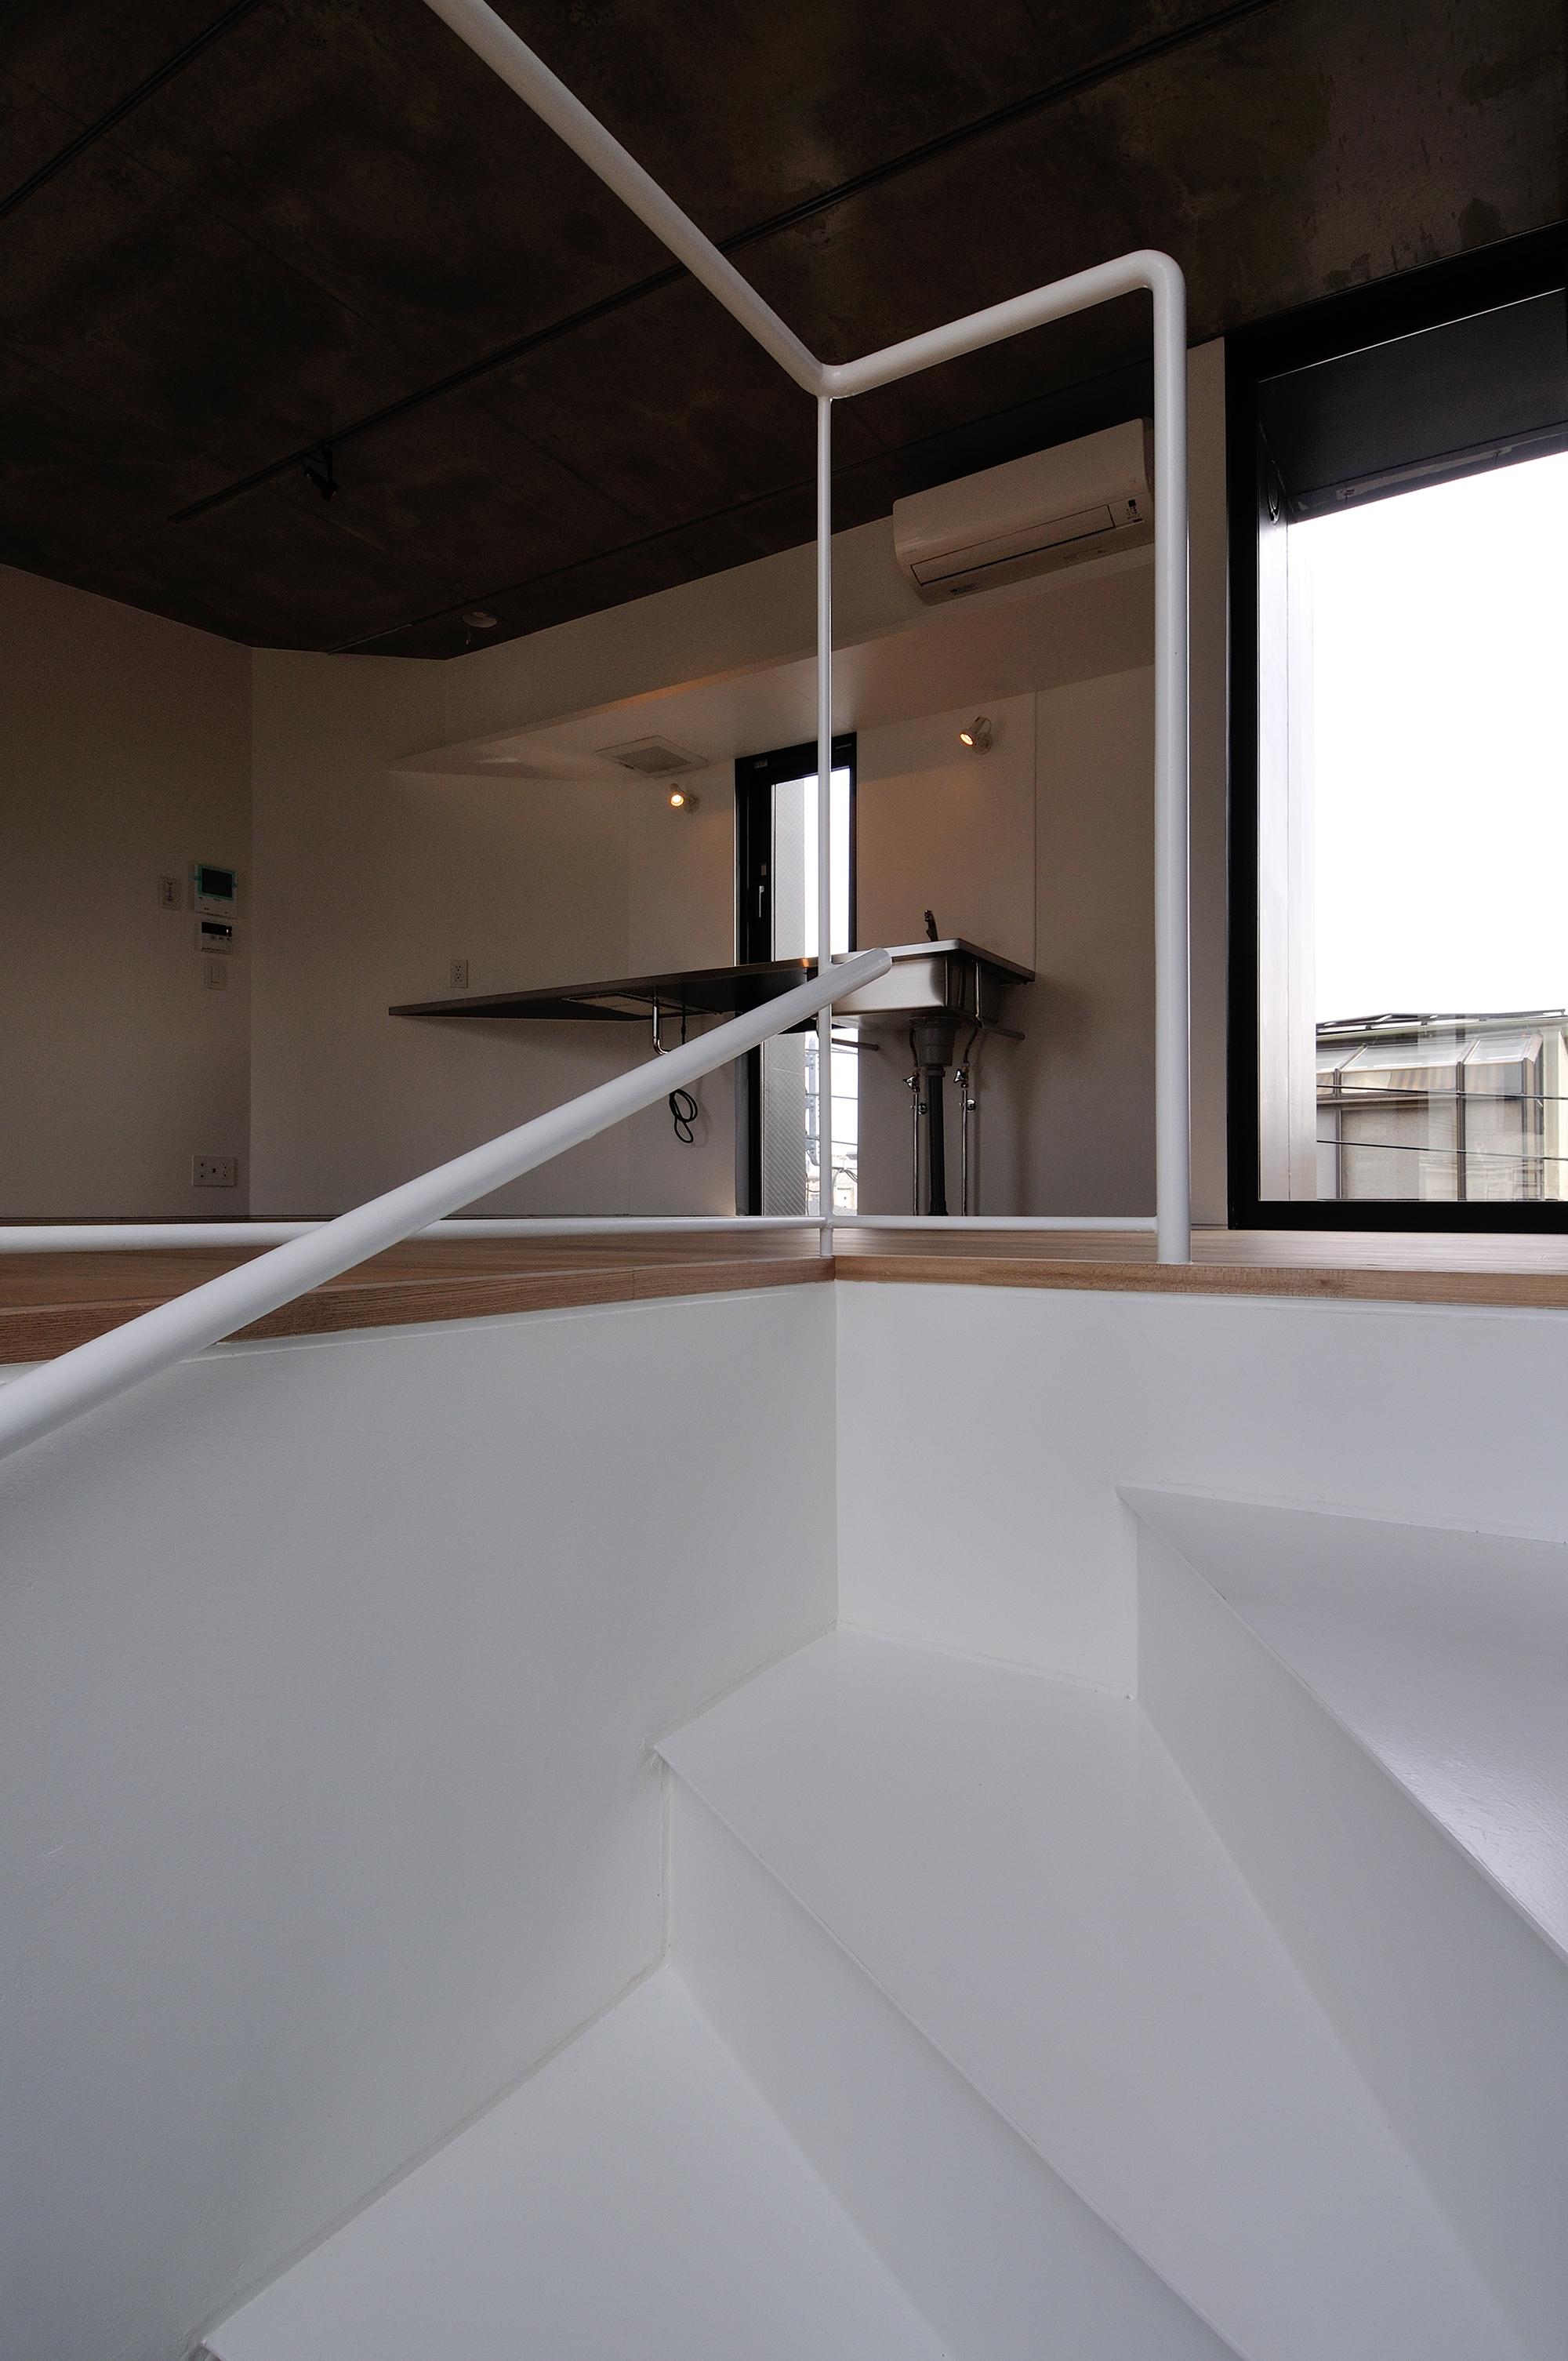 546d51aae58ece3d87000068_kuro-building-kino-architects_0119